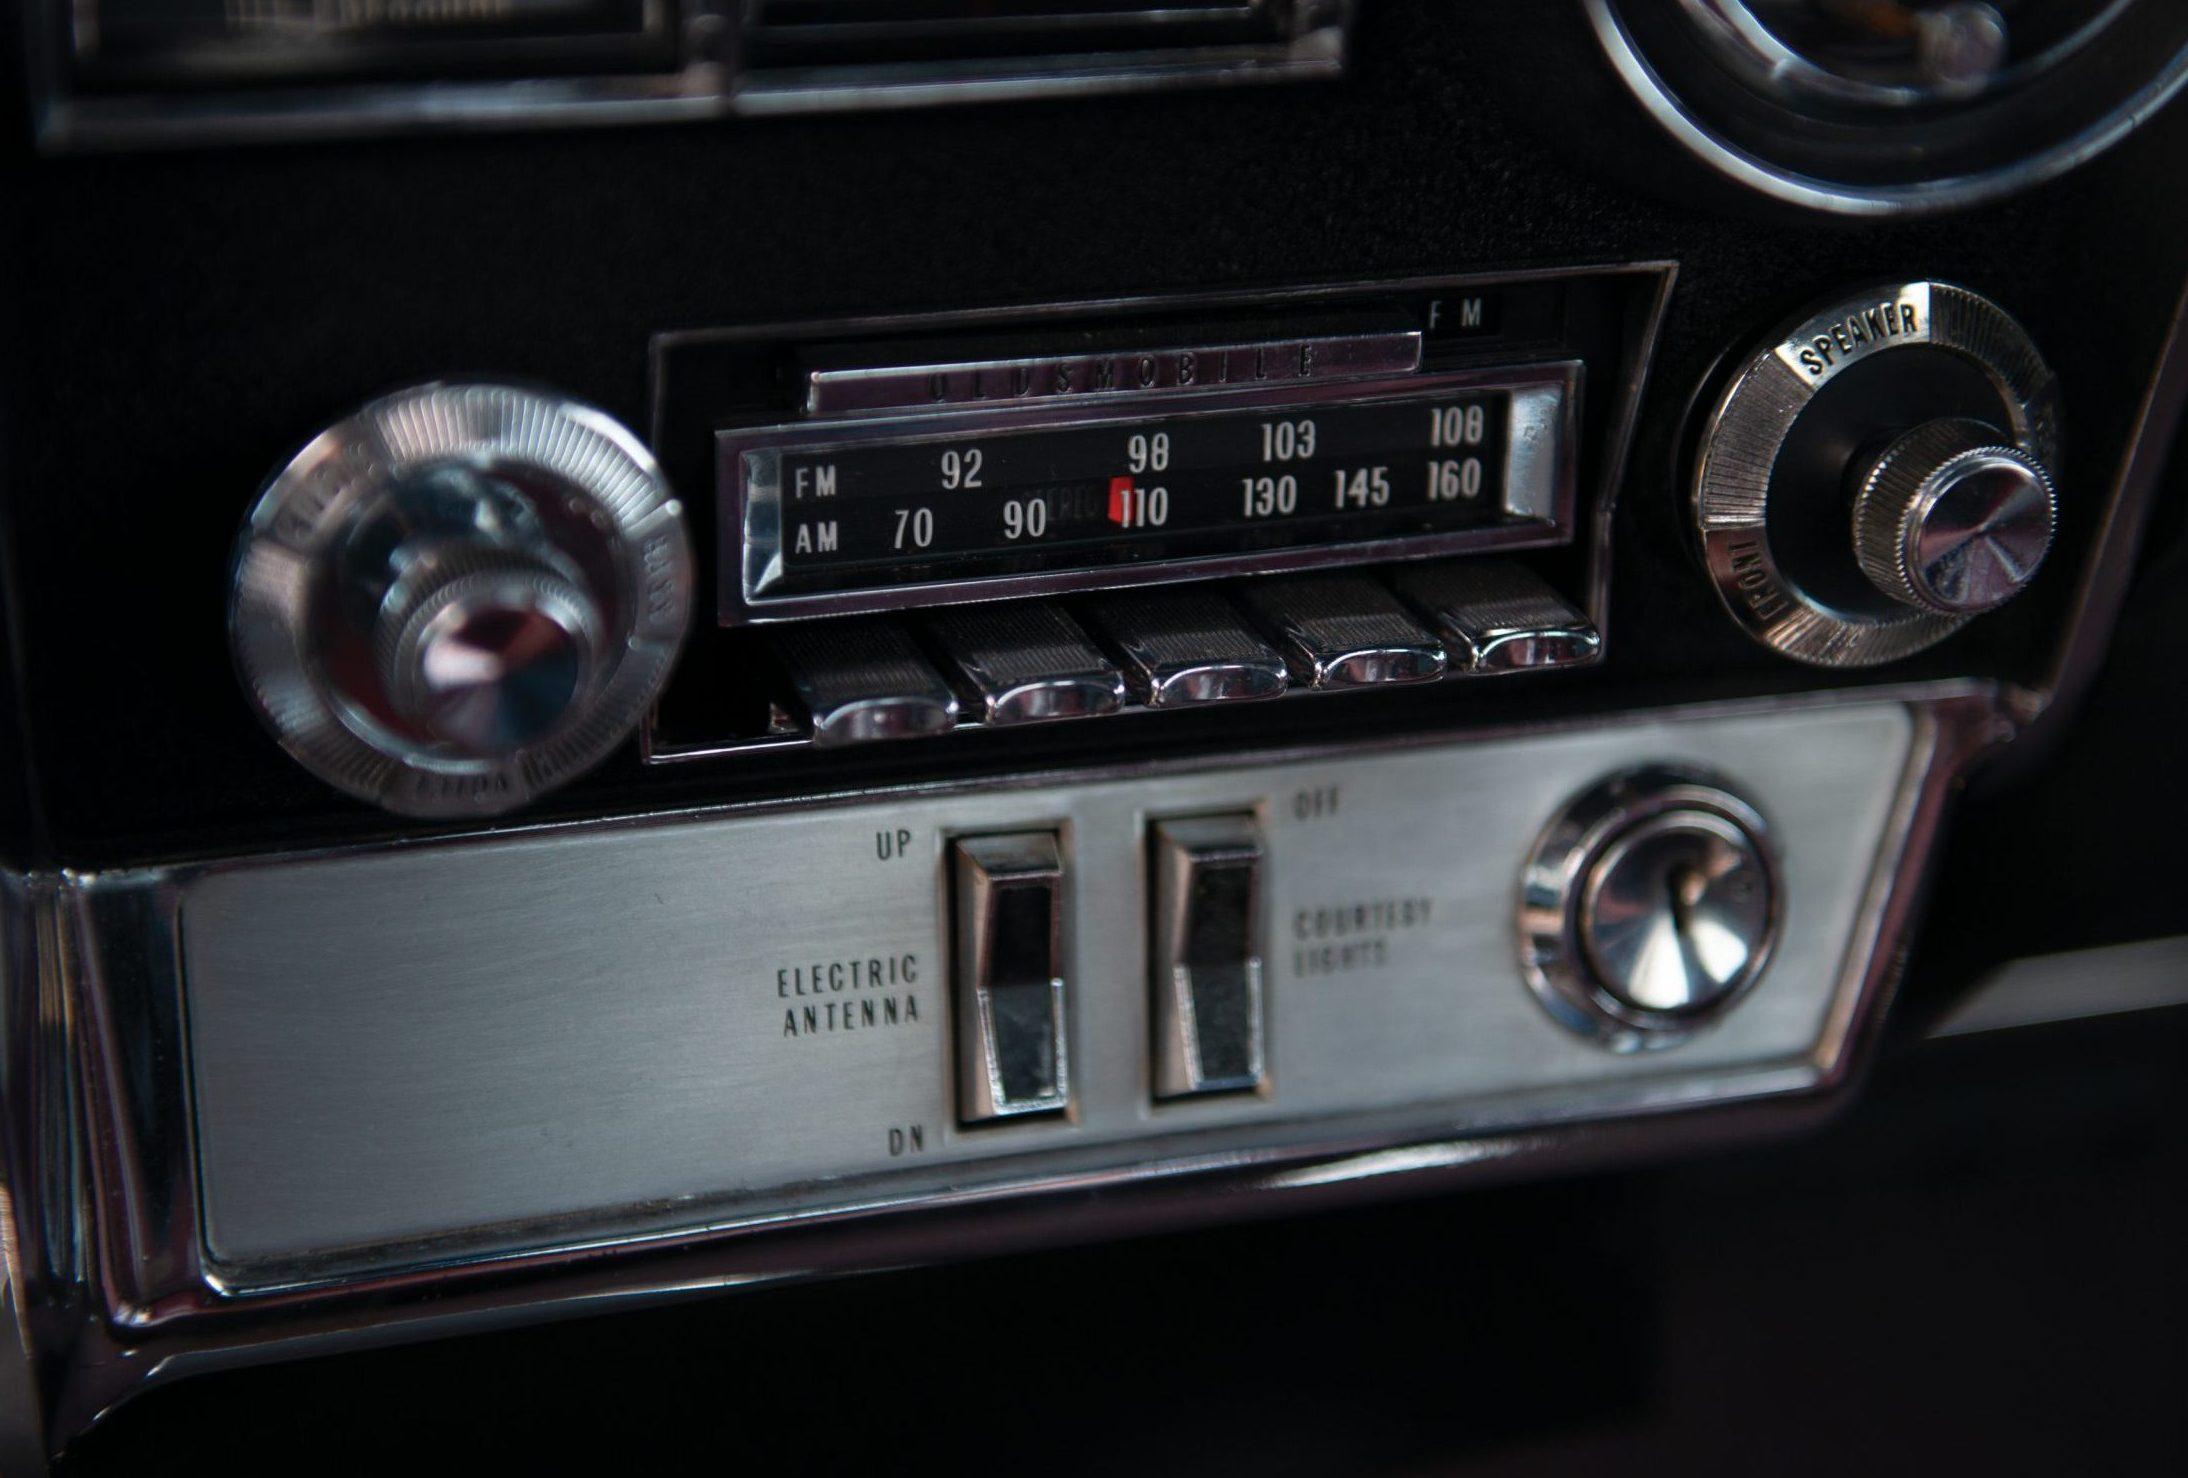 Olds Toronado radio detail